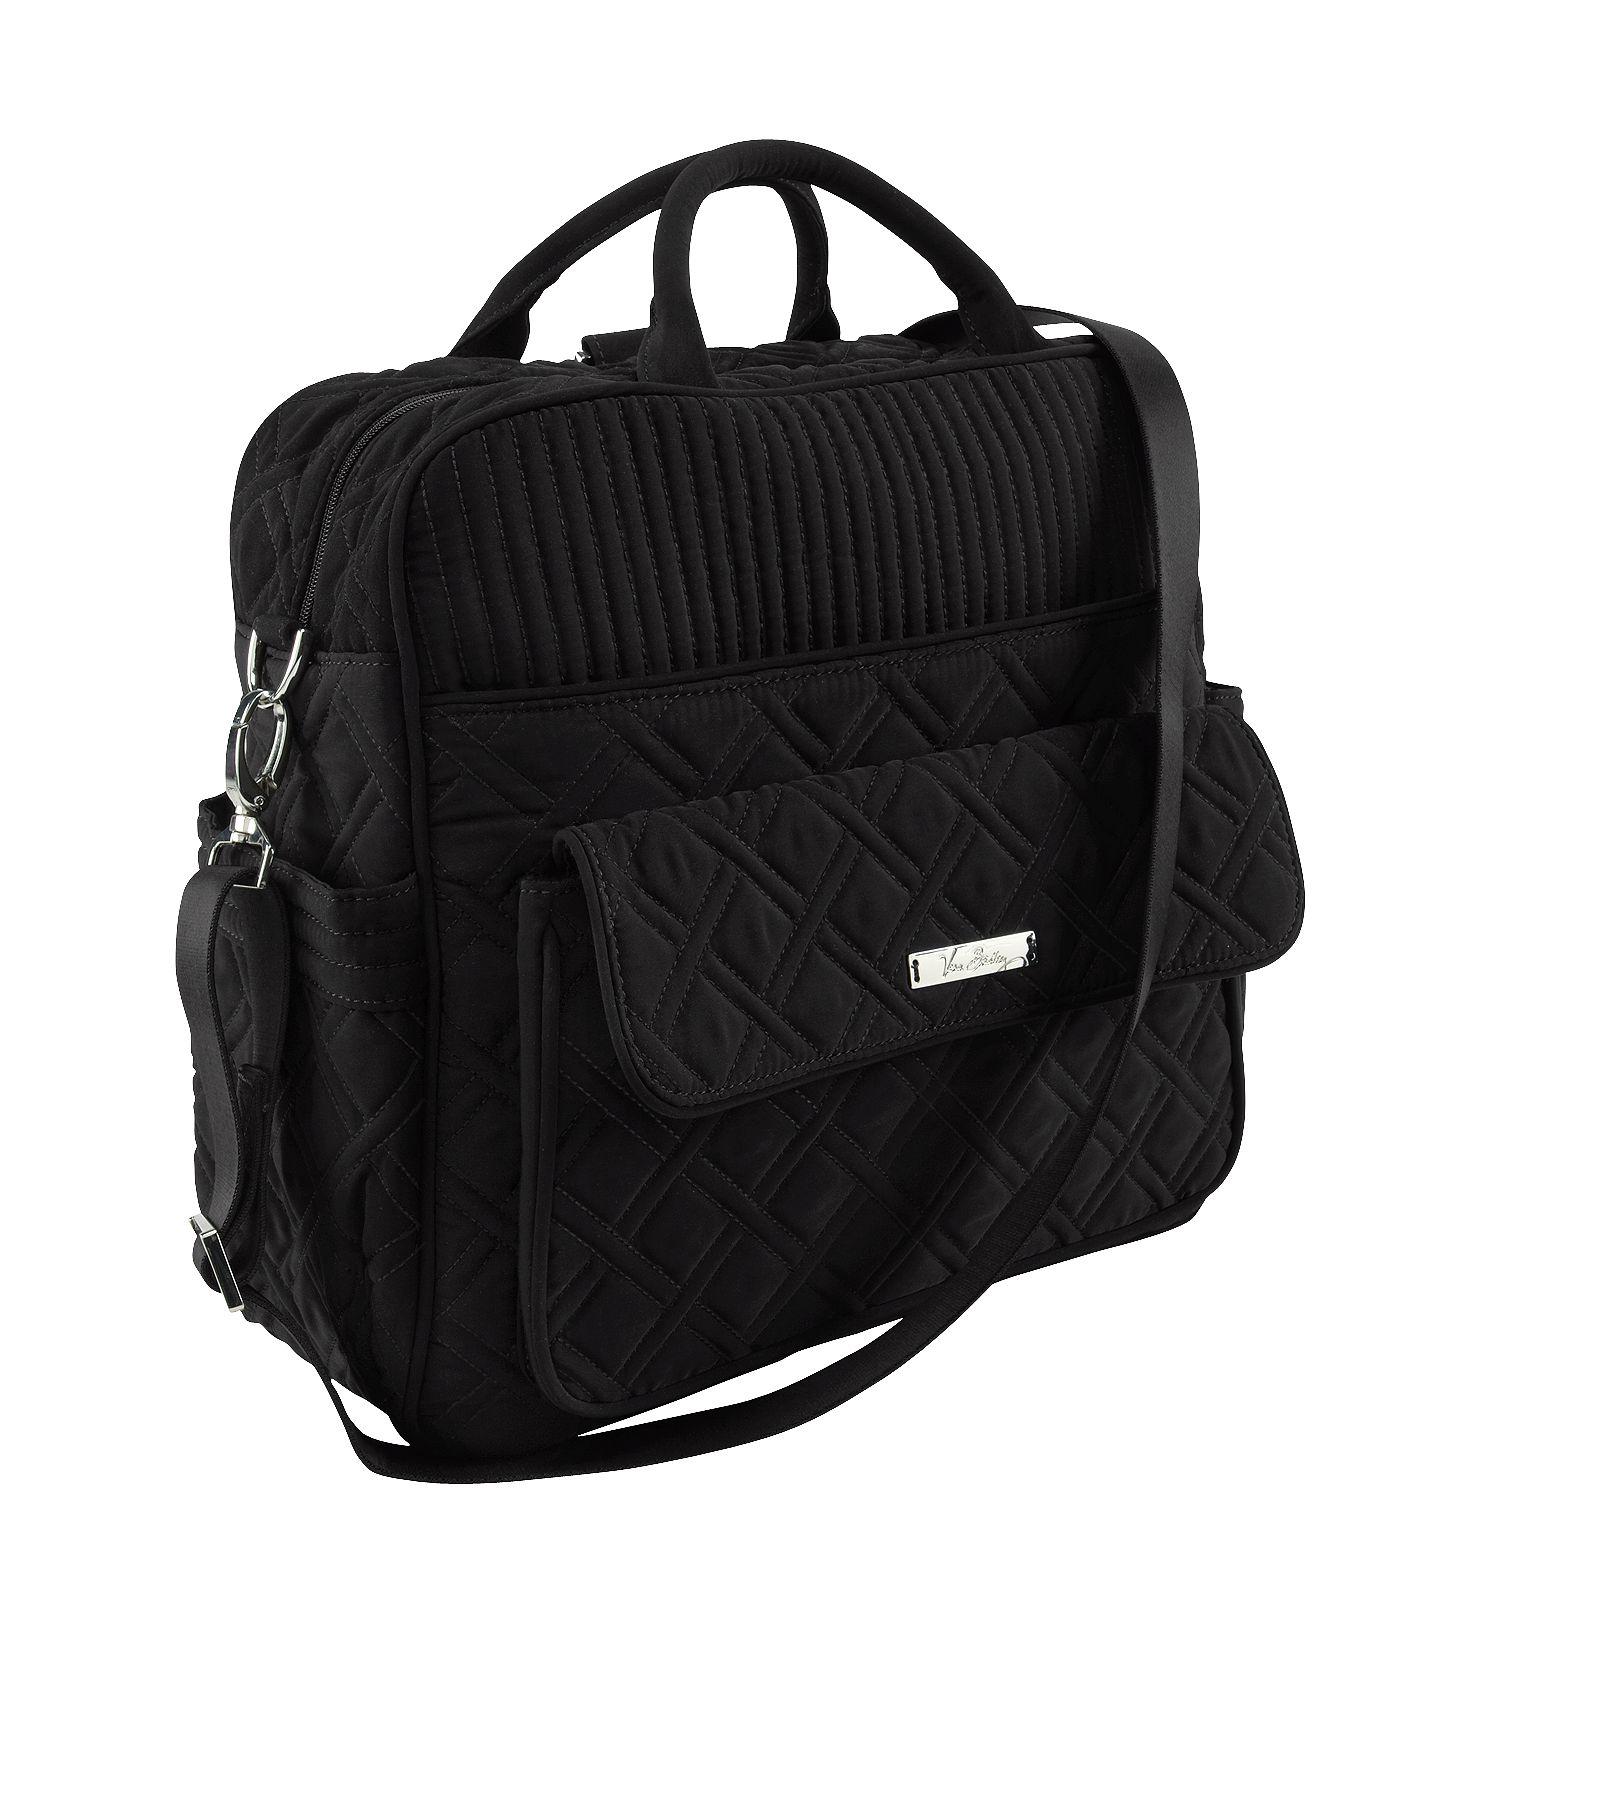 vera bradley handbags vera bradley baby bag in classic black. Black Bedroom Furniture Sets. Home Design Ideas